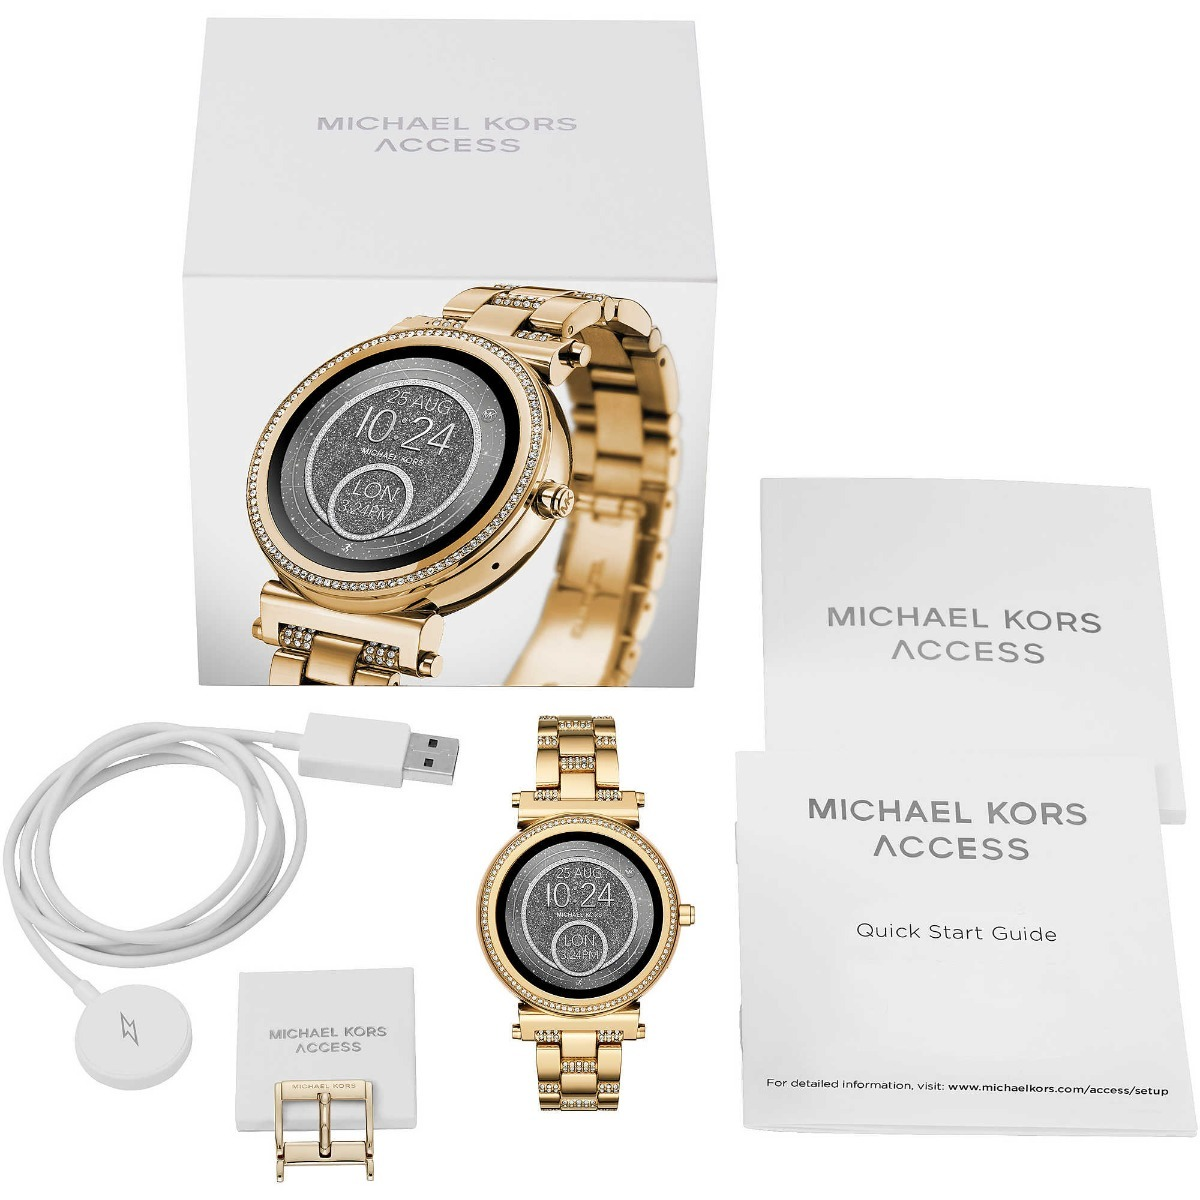 de89e55d7 Relógio Smartwatch Michael Kors Gold Mkt5023 Envio Imediato - R ...